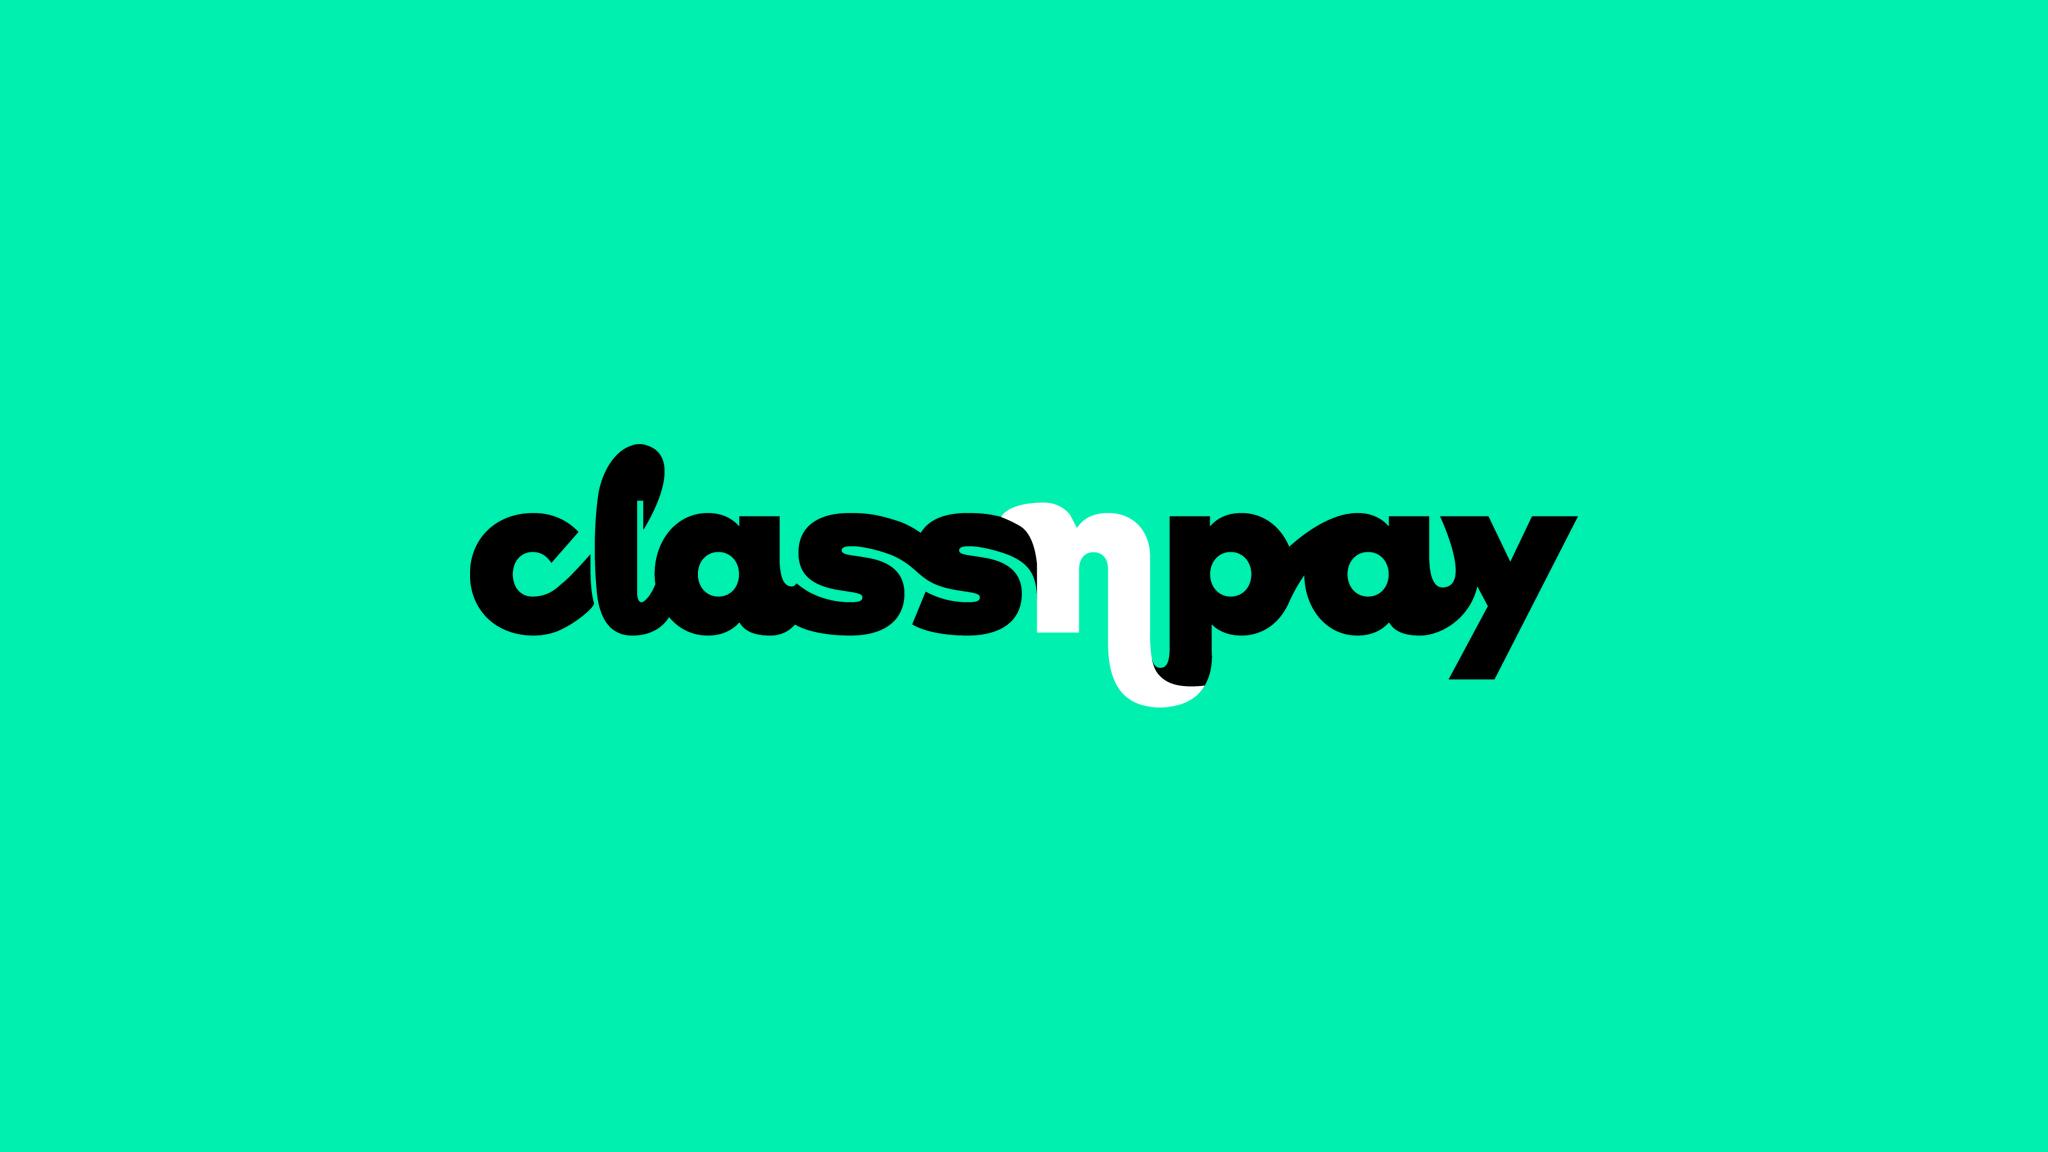 Class 'n' Pay